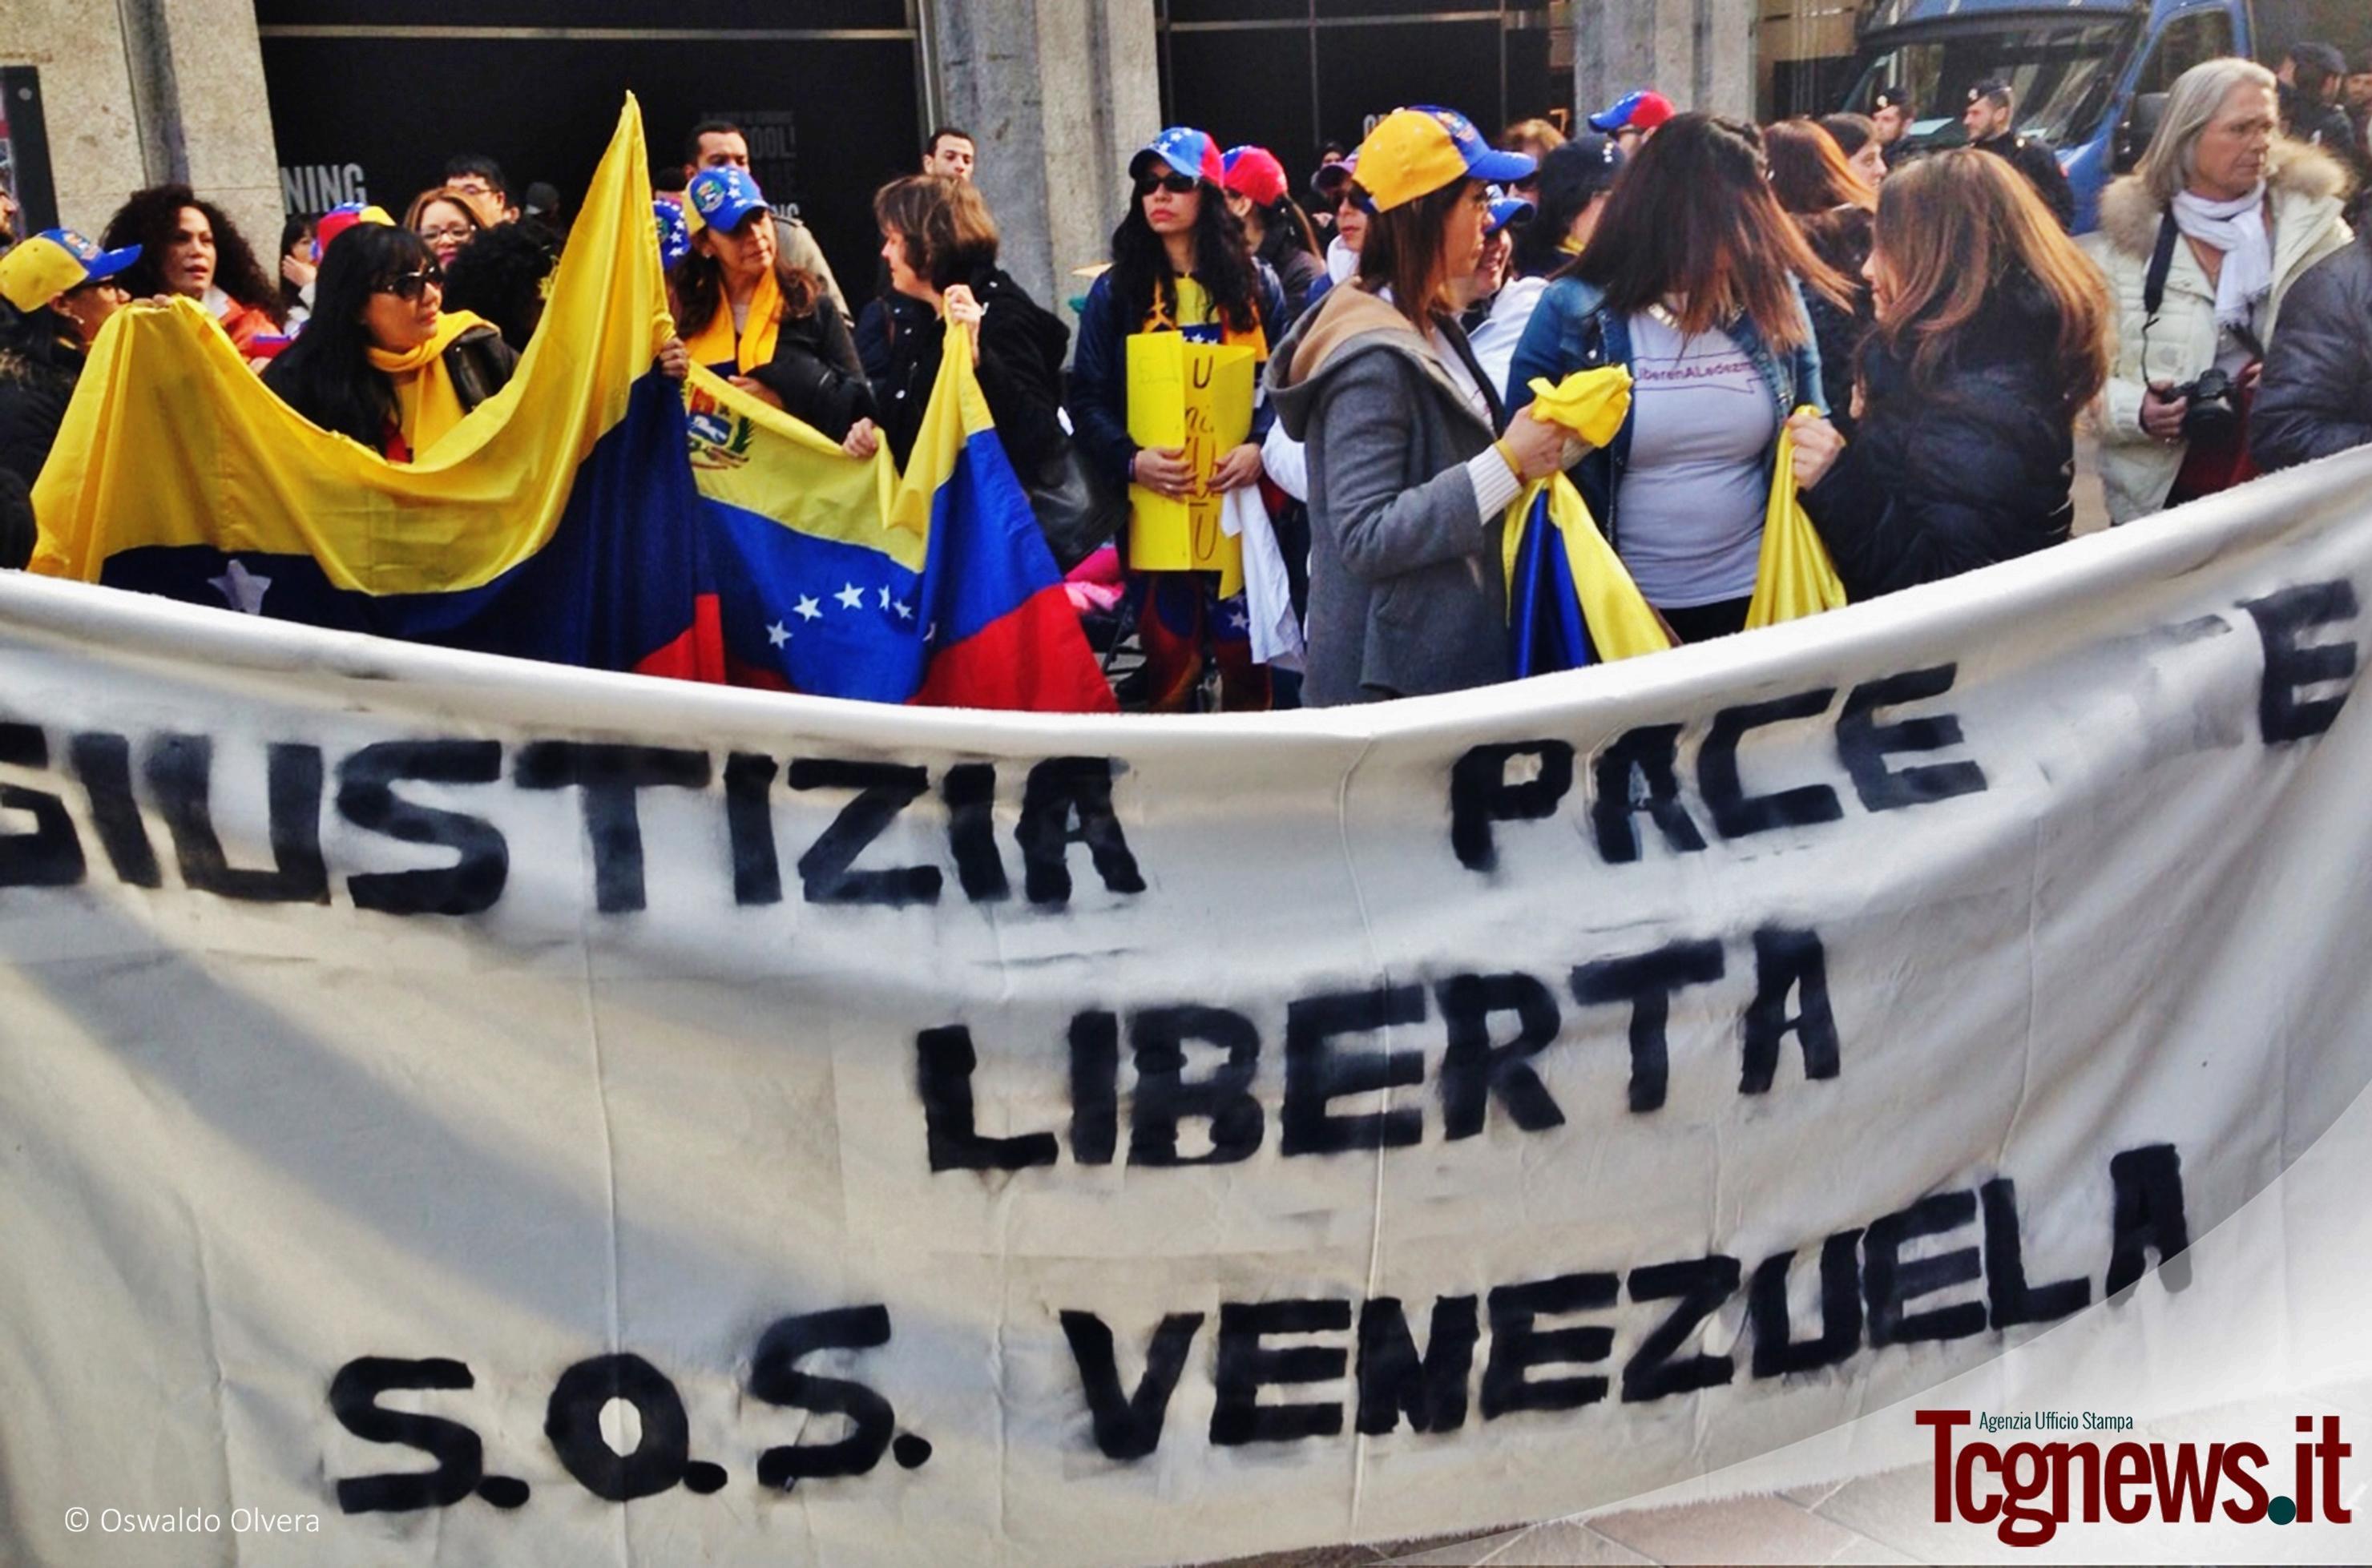 A Milano una manifestazione a favore dei detenuti politici in Venezuela